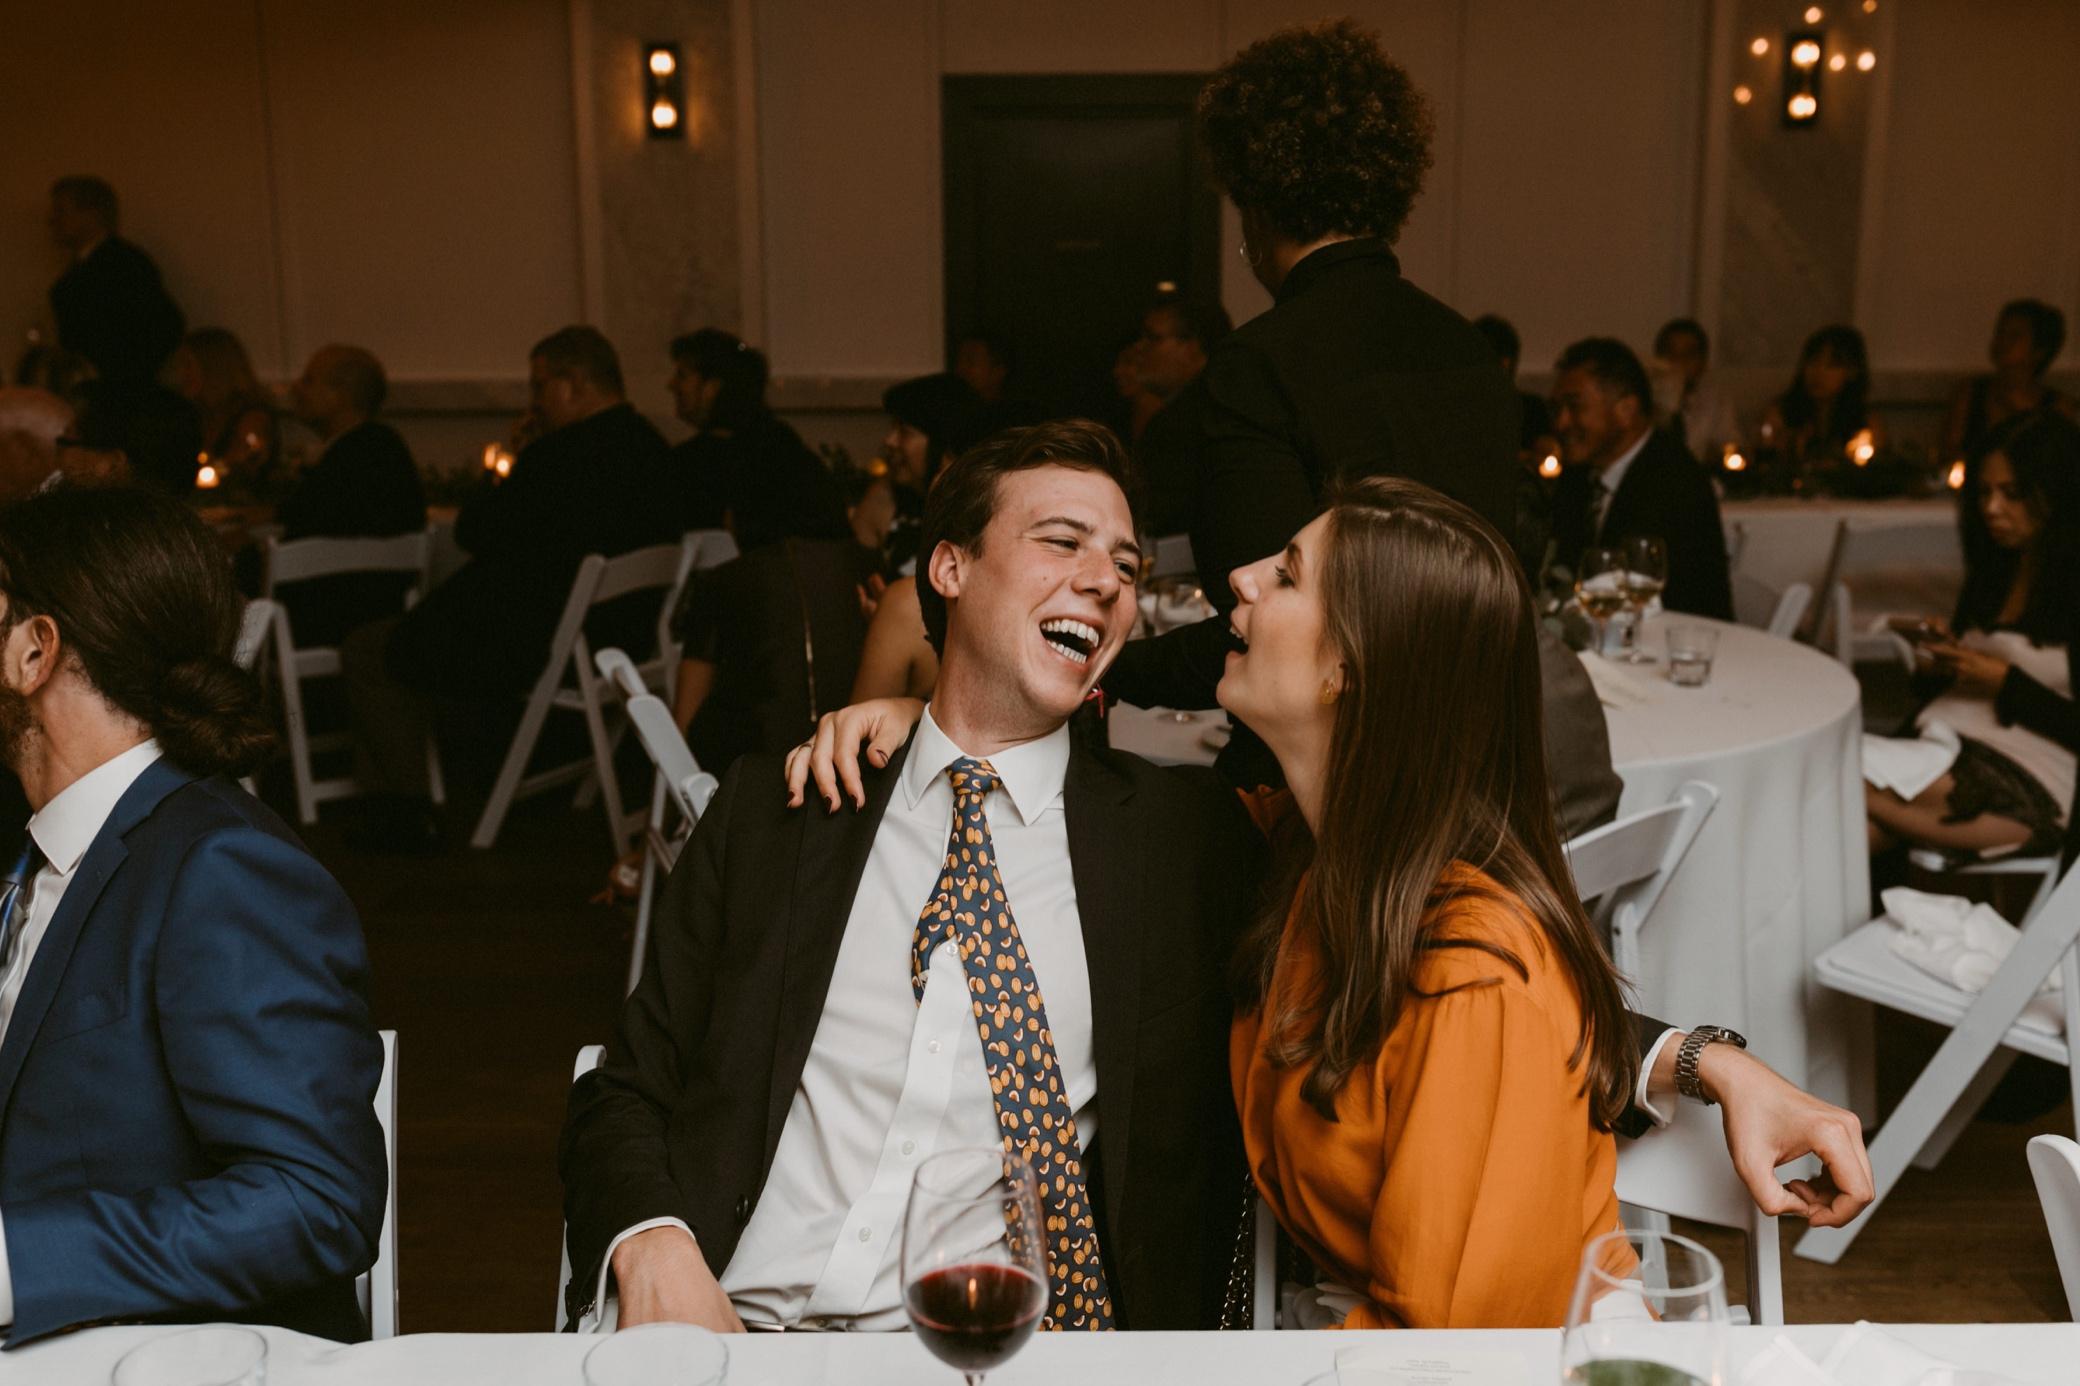 123_The Broadview Hotel Wedding (776 of 913).jpg